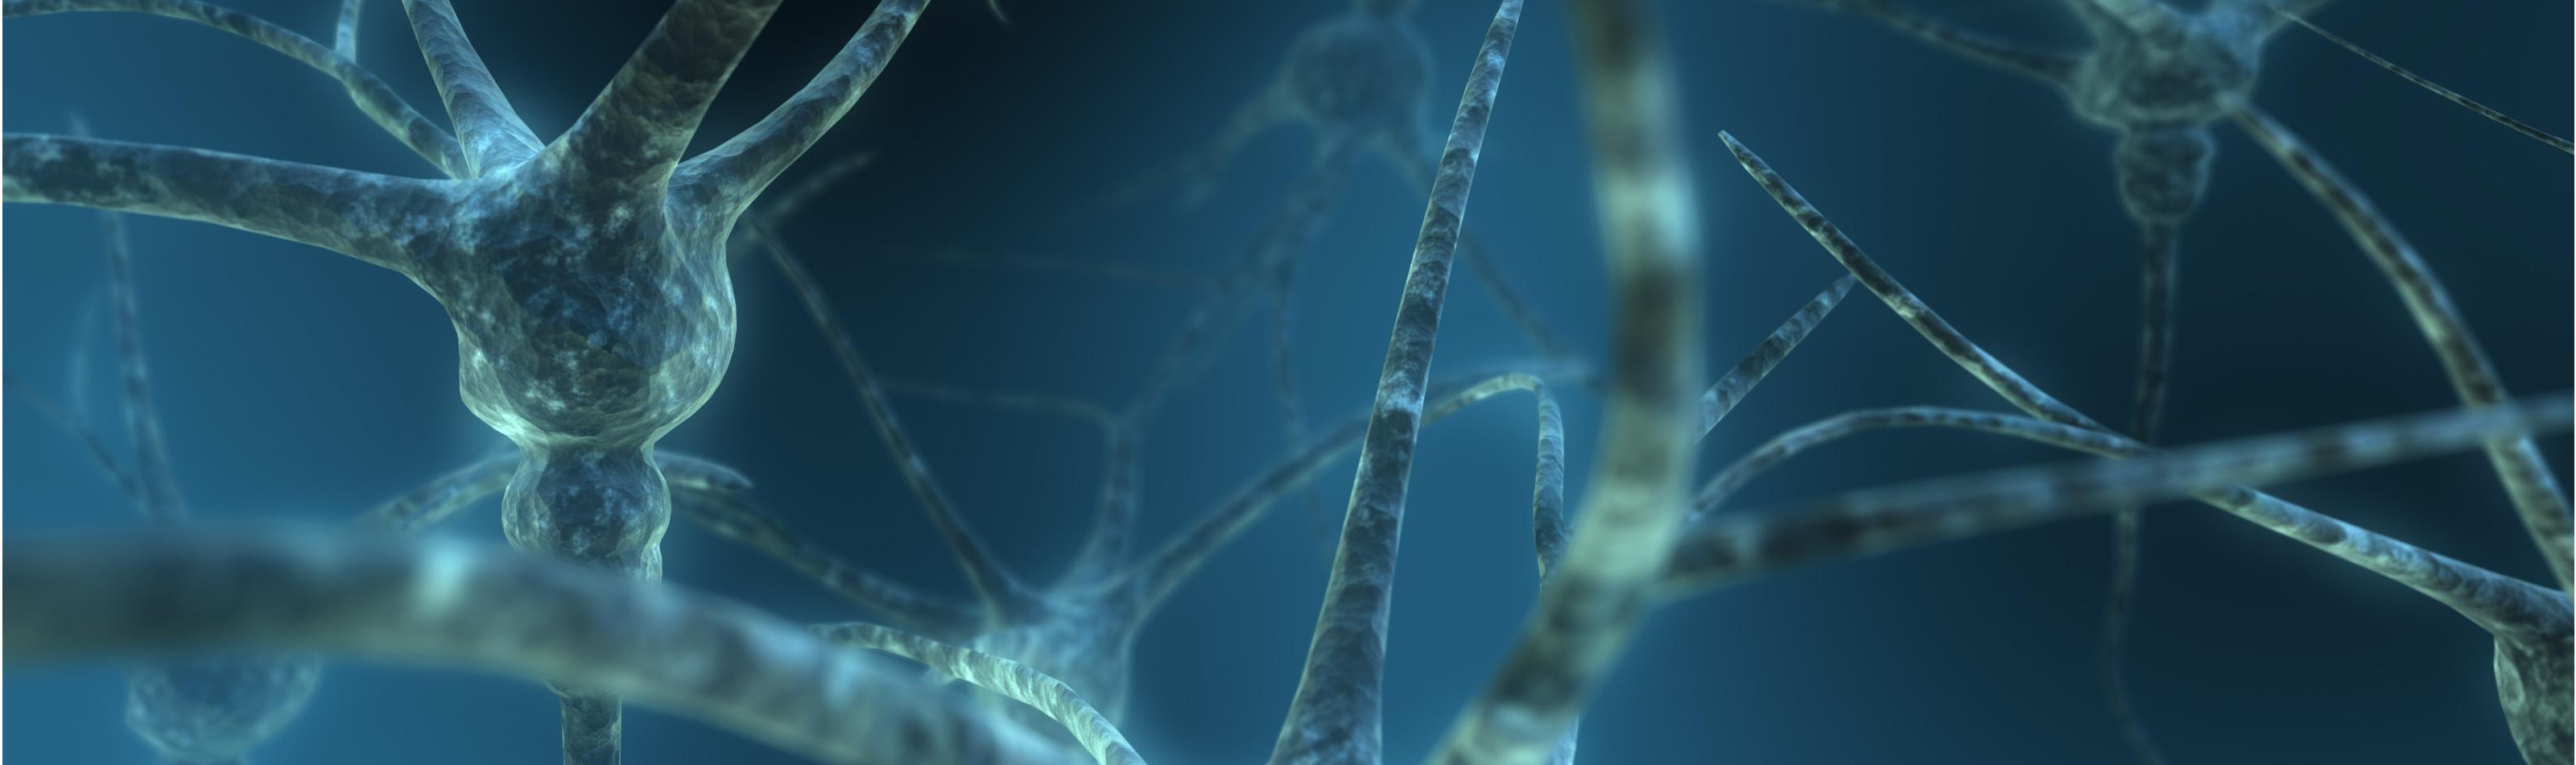 neuron-wallpaper